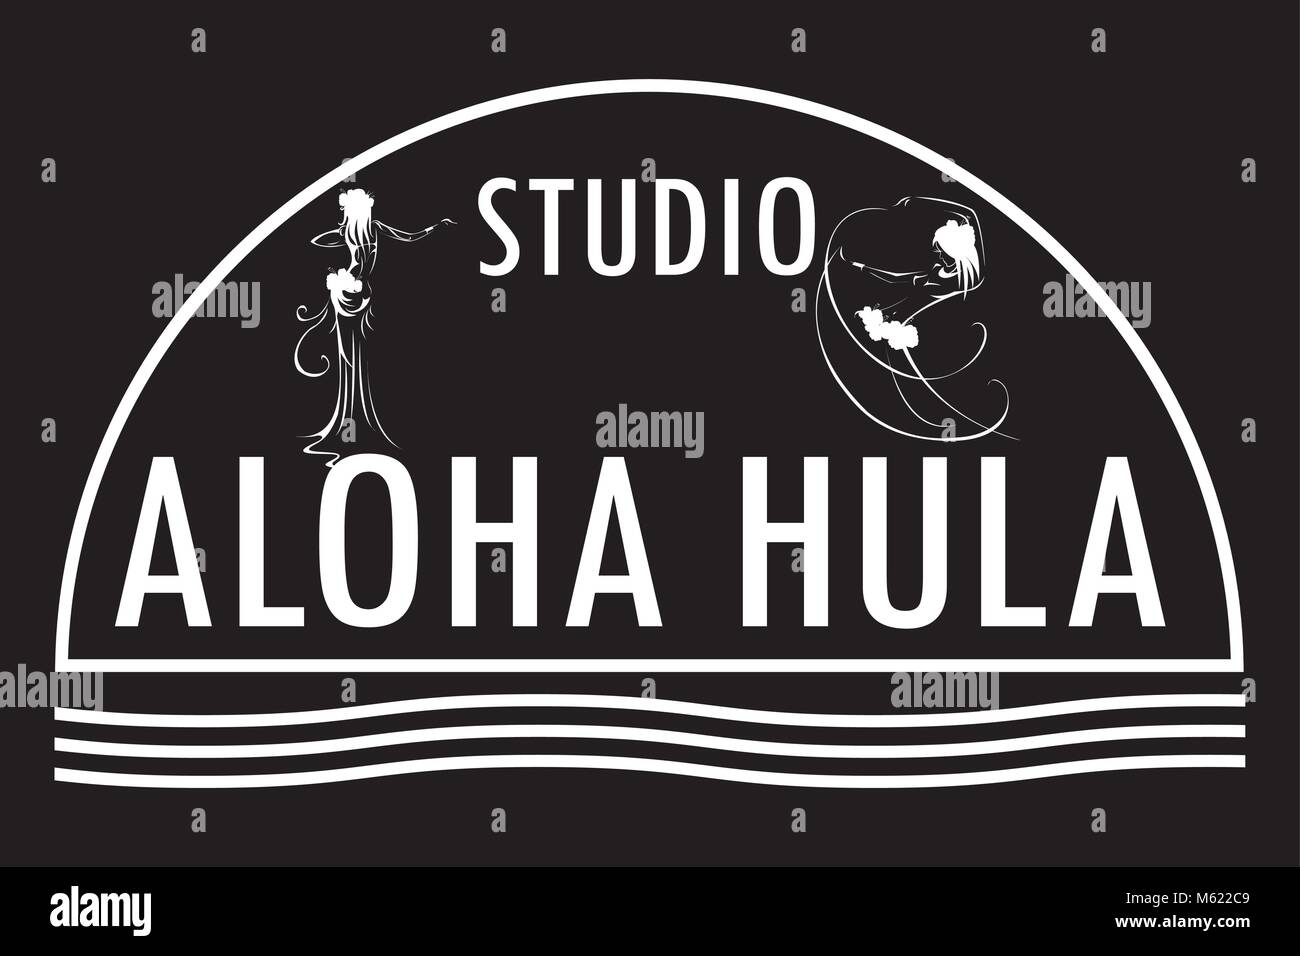 Hawaii vector logo design template.Studio aloha hula icon. - Stock Vector